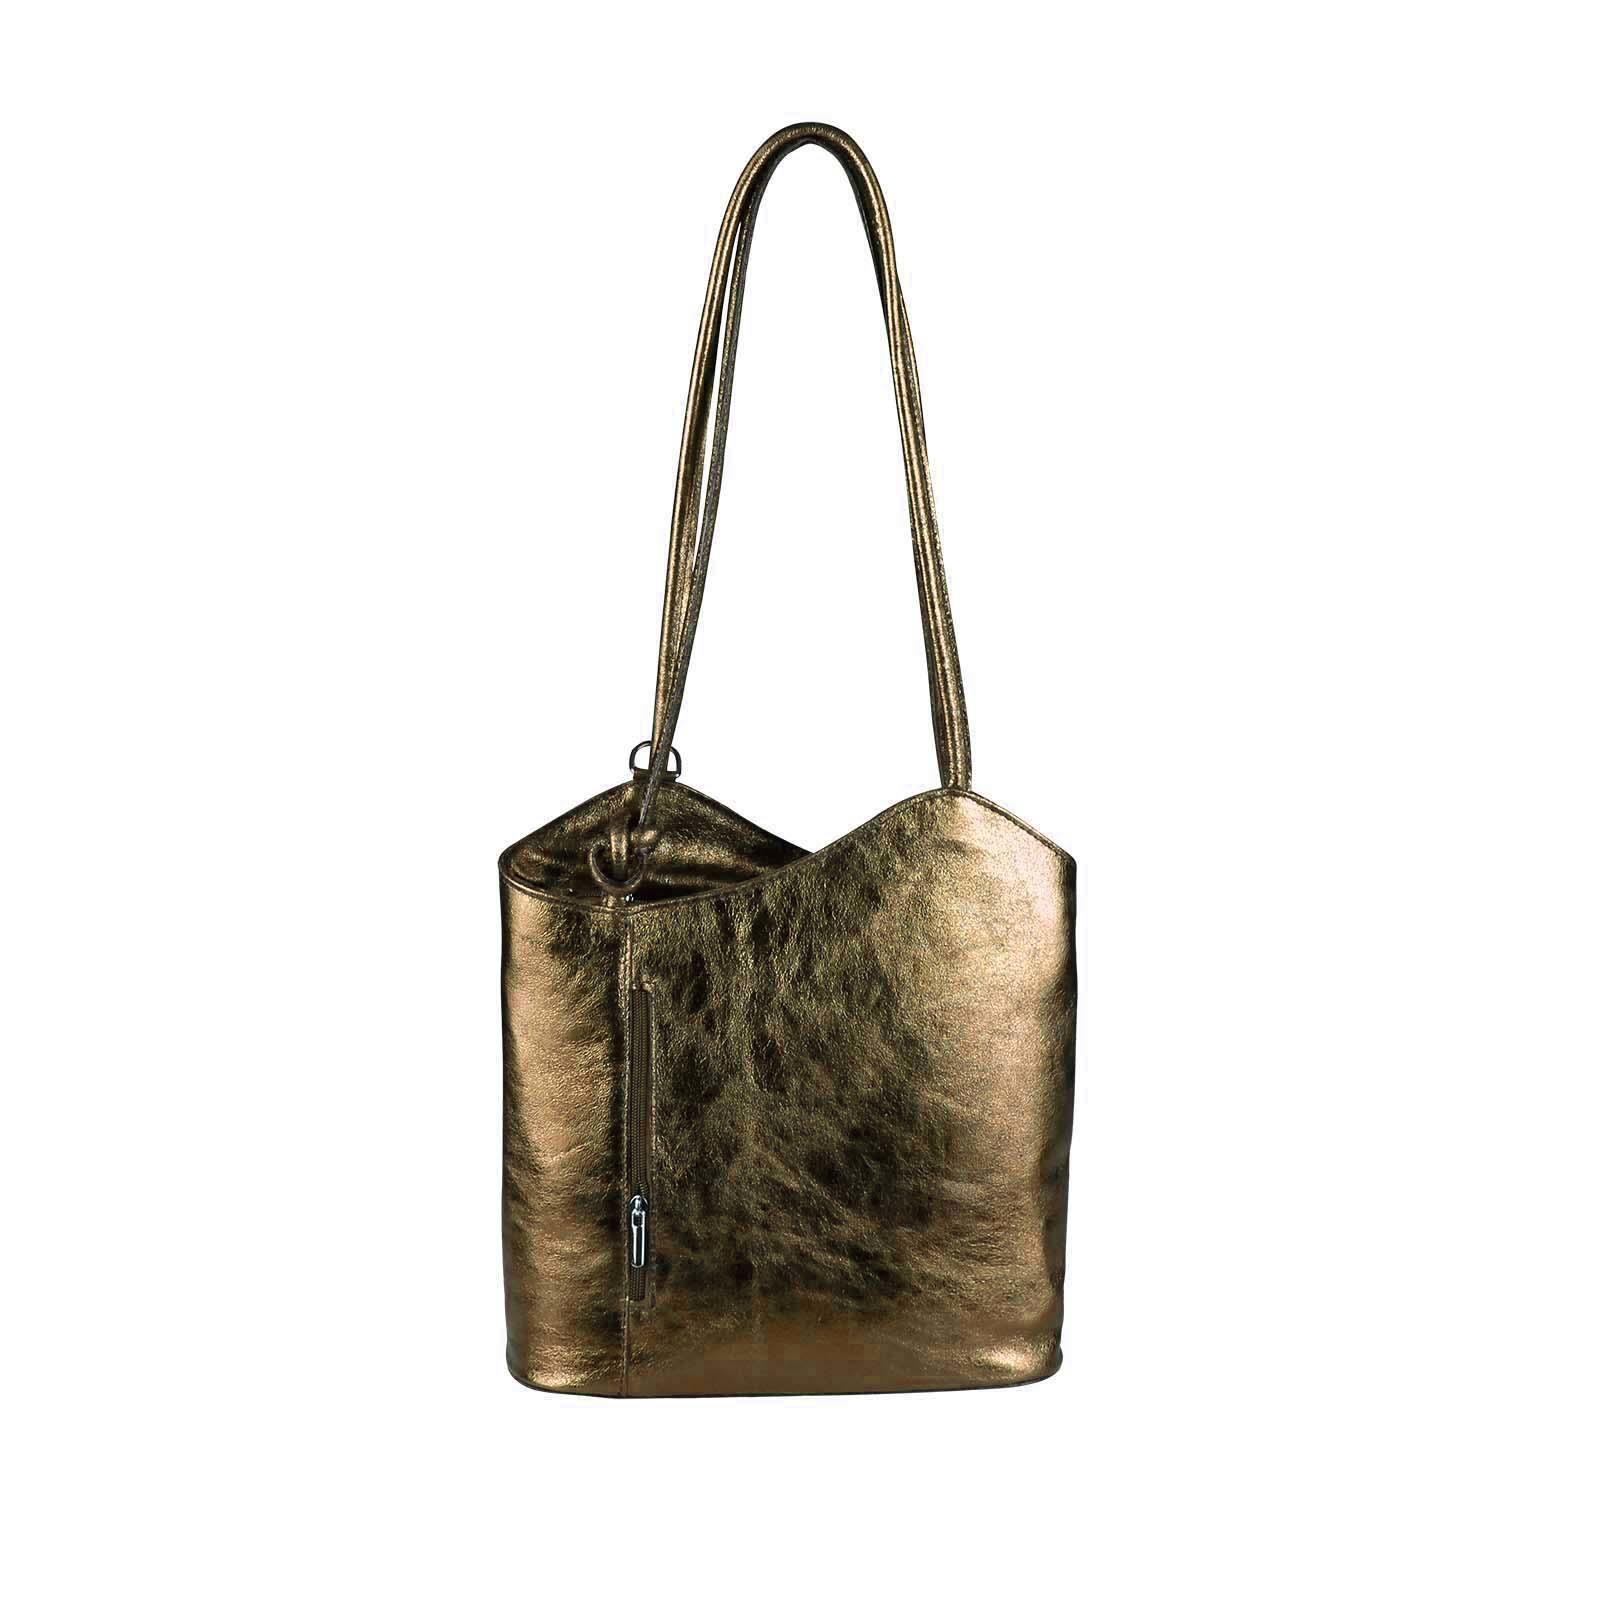 89073051bac1a OBC ITAL DAMEN LEDER TASCHE RUCKSACK Handtasche Umhängetasche  Schultertasche Shopper Henkeltasche Ledertasche Backpack (Weiß)